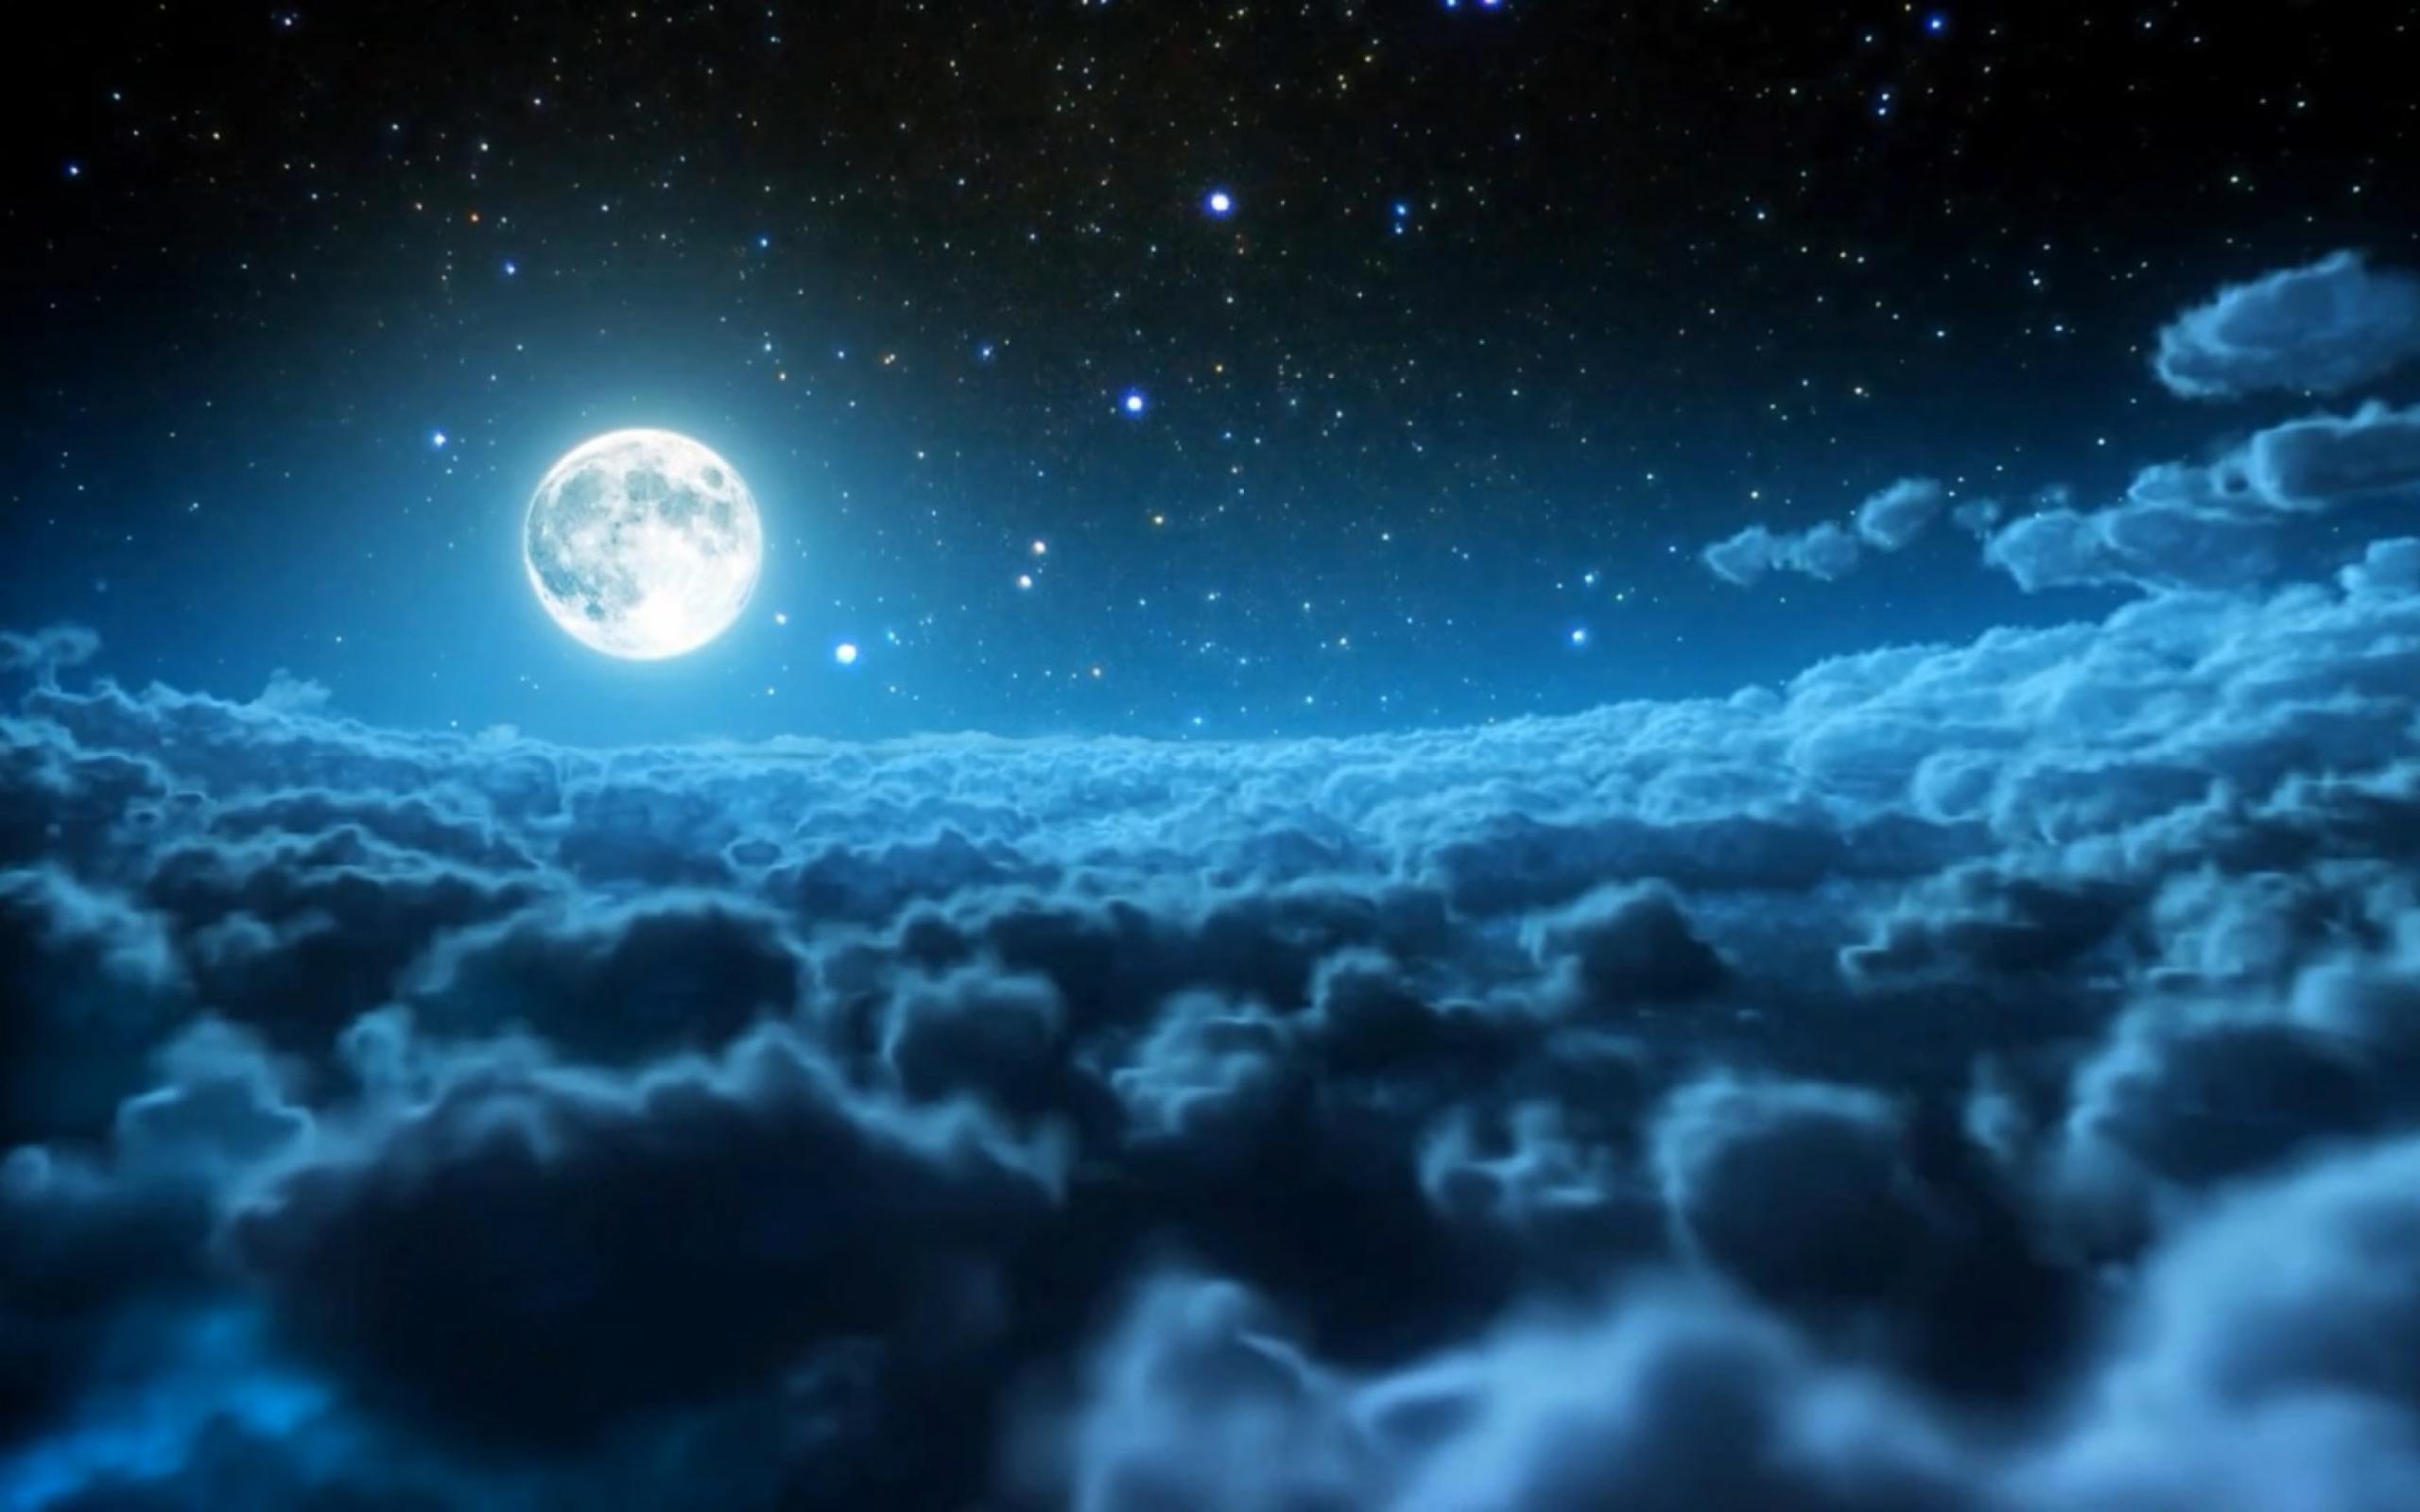 Walpurgis Night An Abbreviation Of Saint Walpurgis Night From The German Sankt Walpurgisnacht Saŋkt Valˈpʊʁɡɪsˌnaχt Also Known As Saint Walpurgas Eve